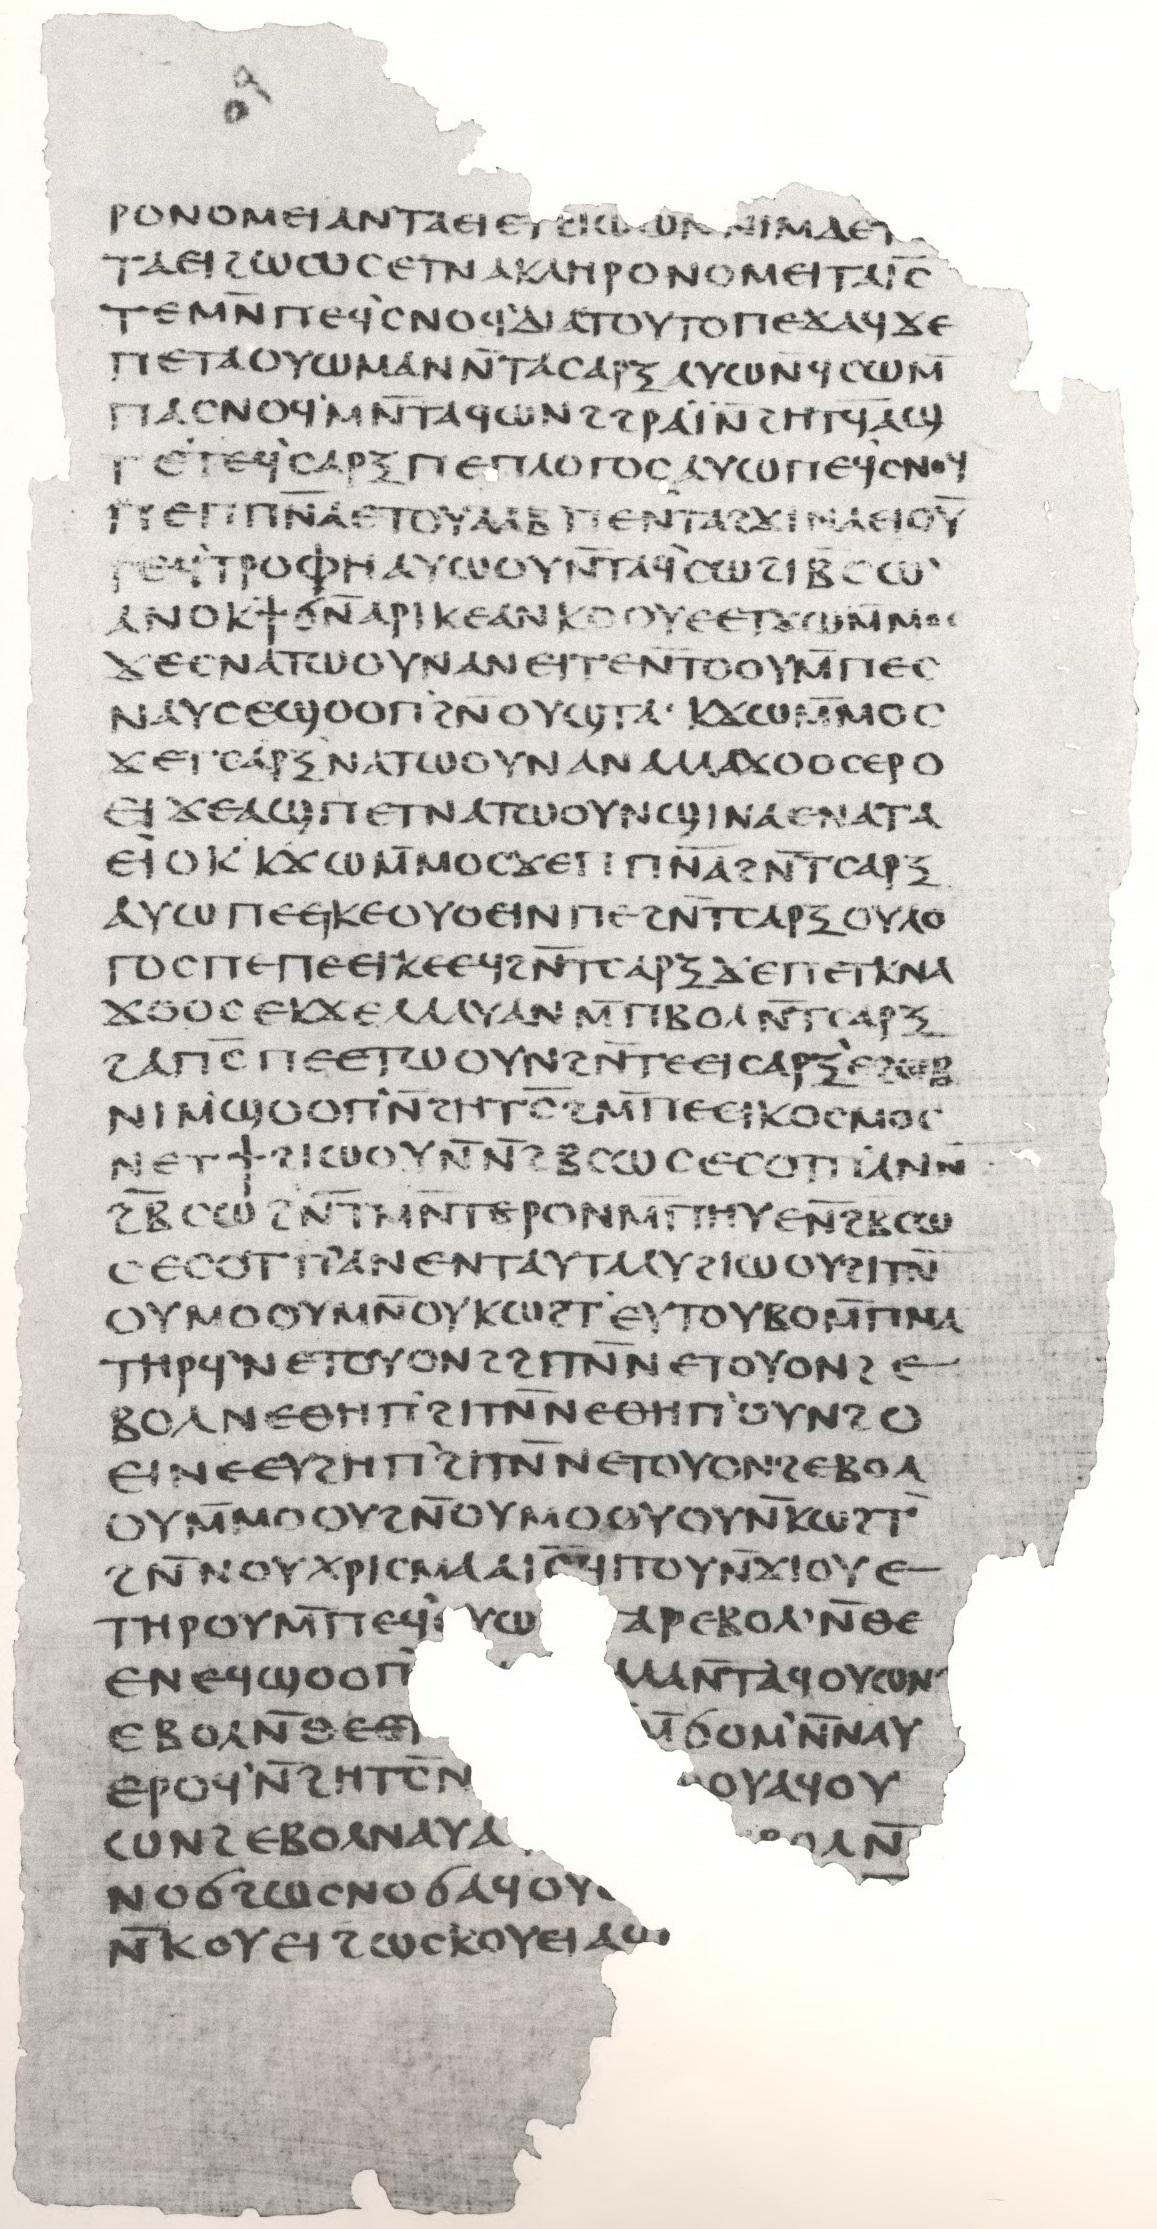 Gospel_of_Philip_facsimile_Page_57.jpg